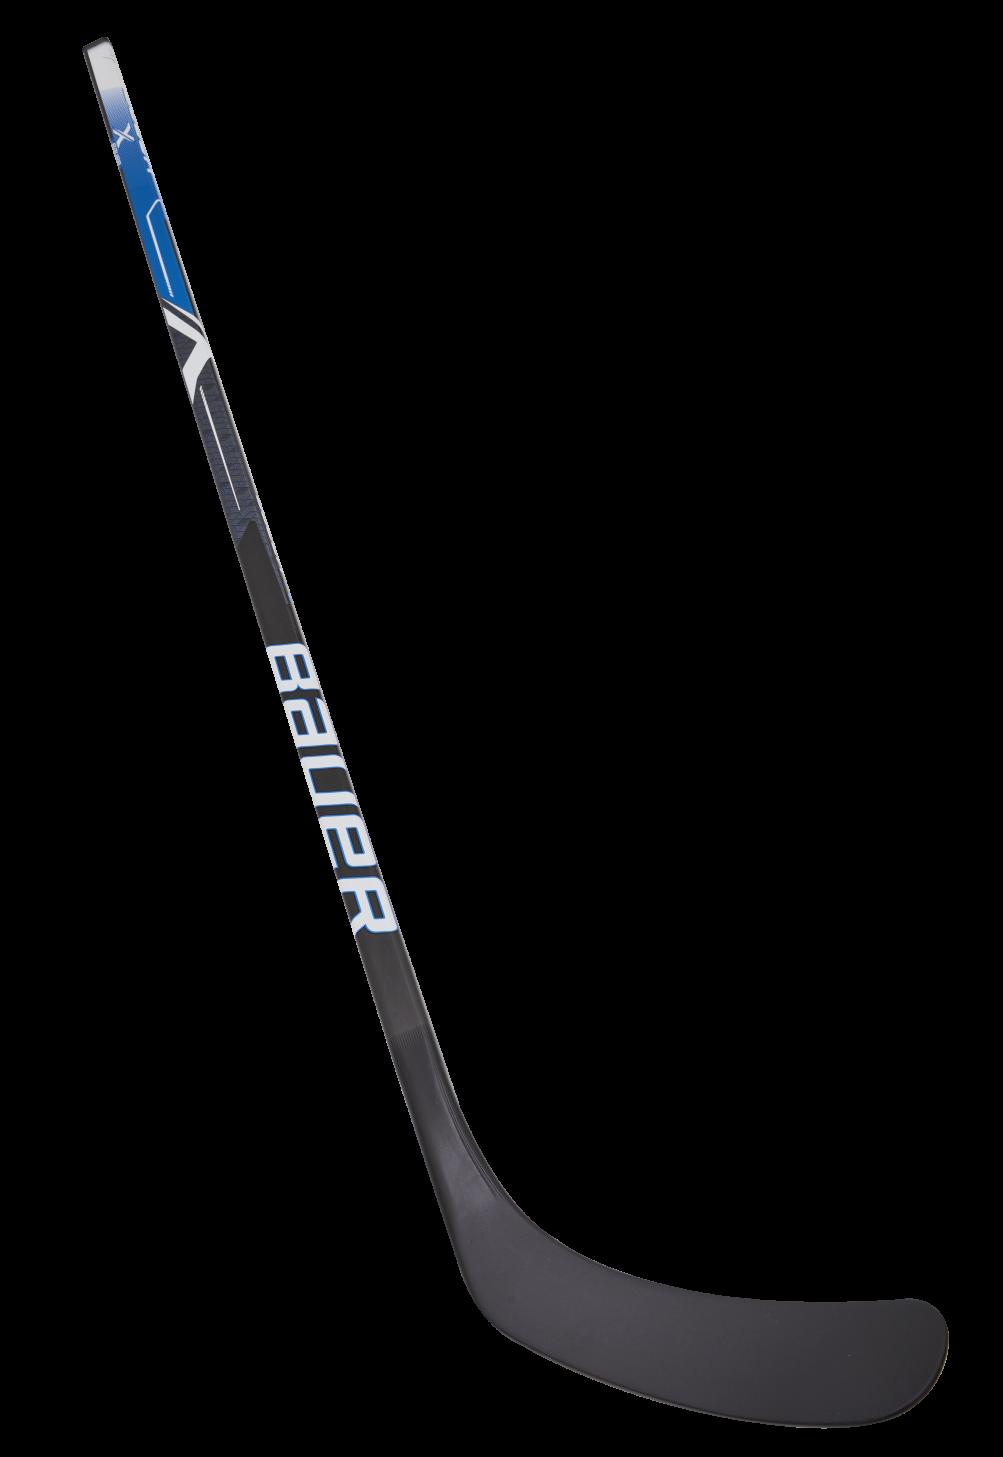 Hokejka Bauer X